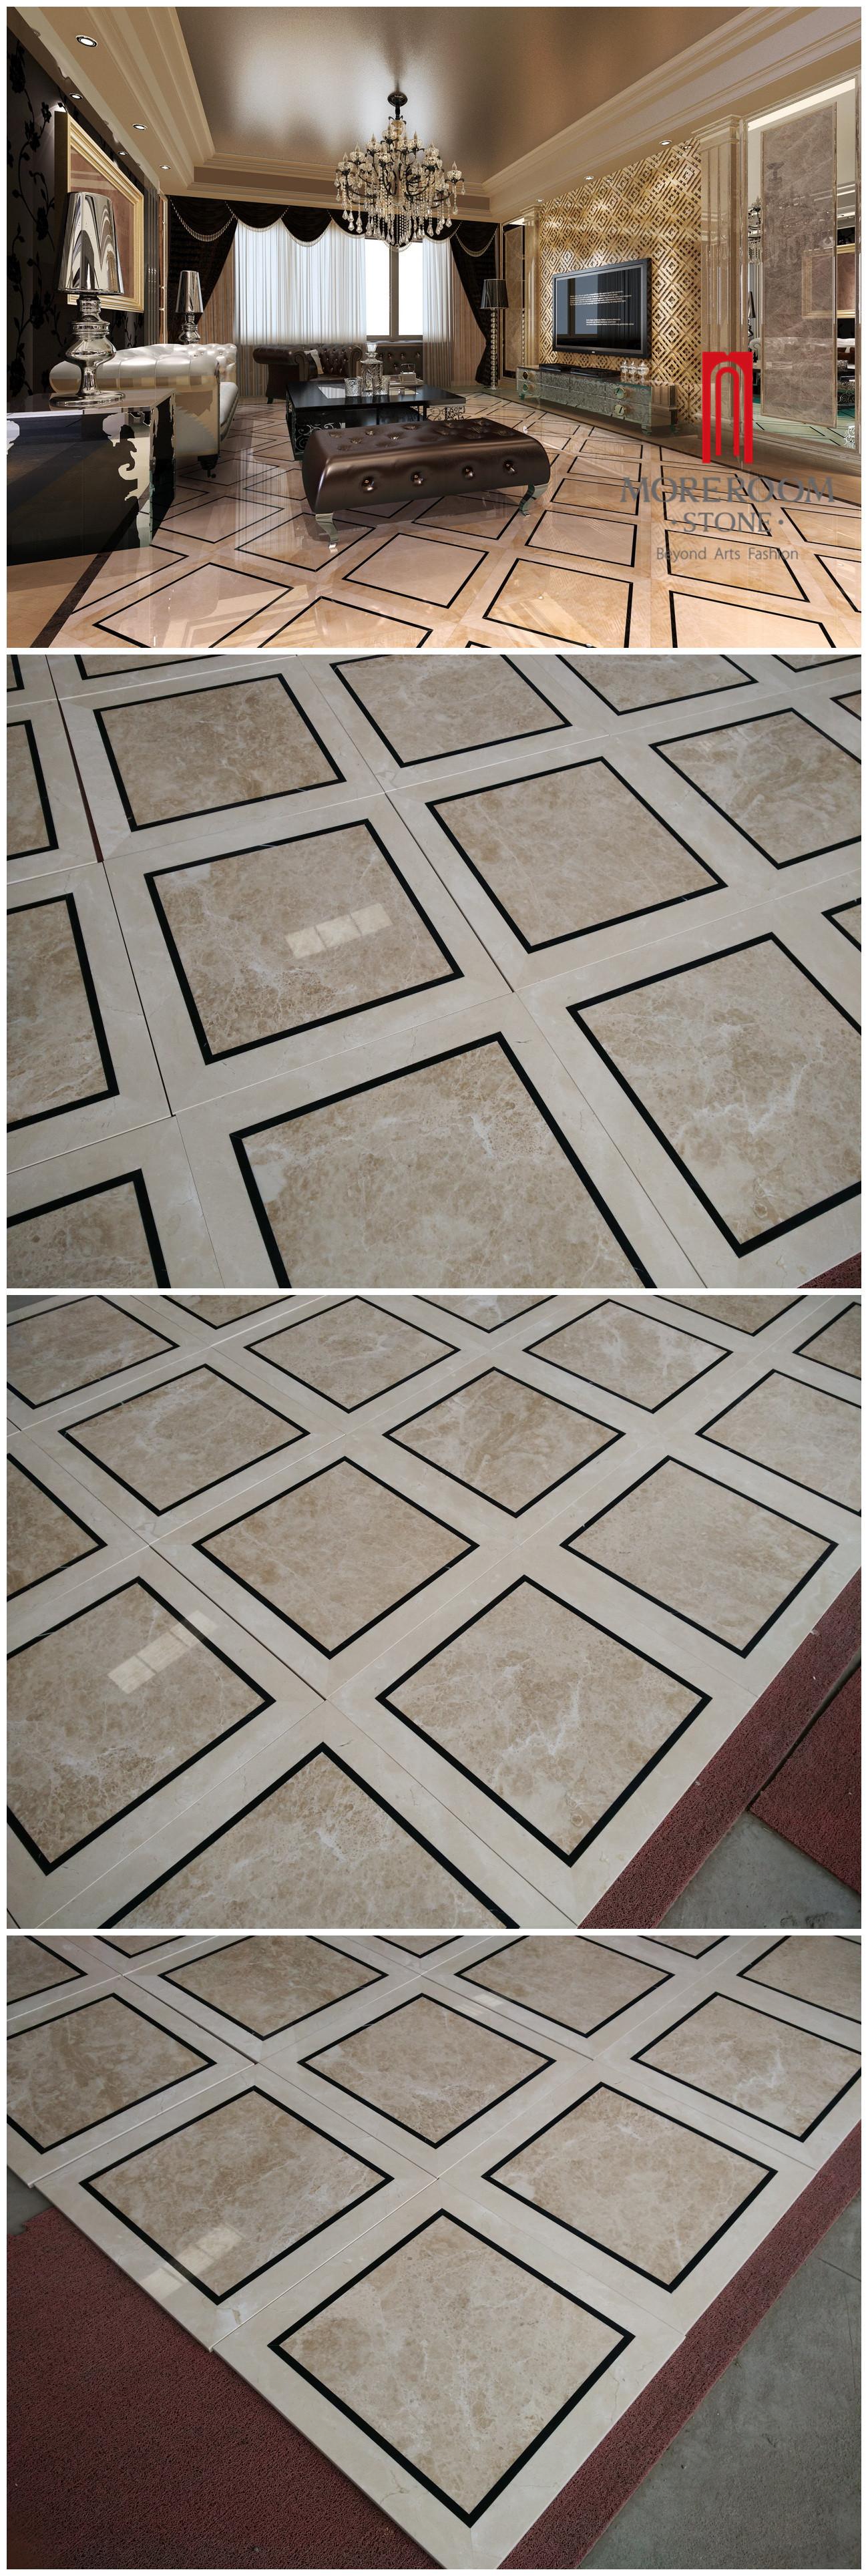 Marble Flooring Foshan Moreroom Stone Co.,Ltd  Aggie Chan  Tel:86-13923220432  Email:sals04@moreroomstone.com